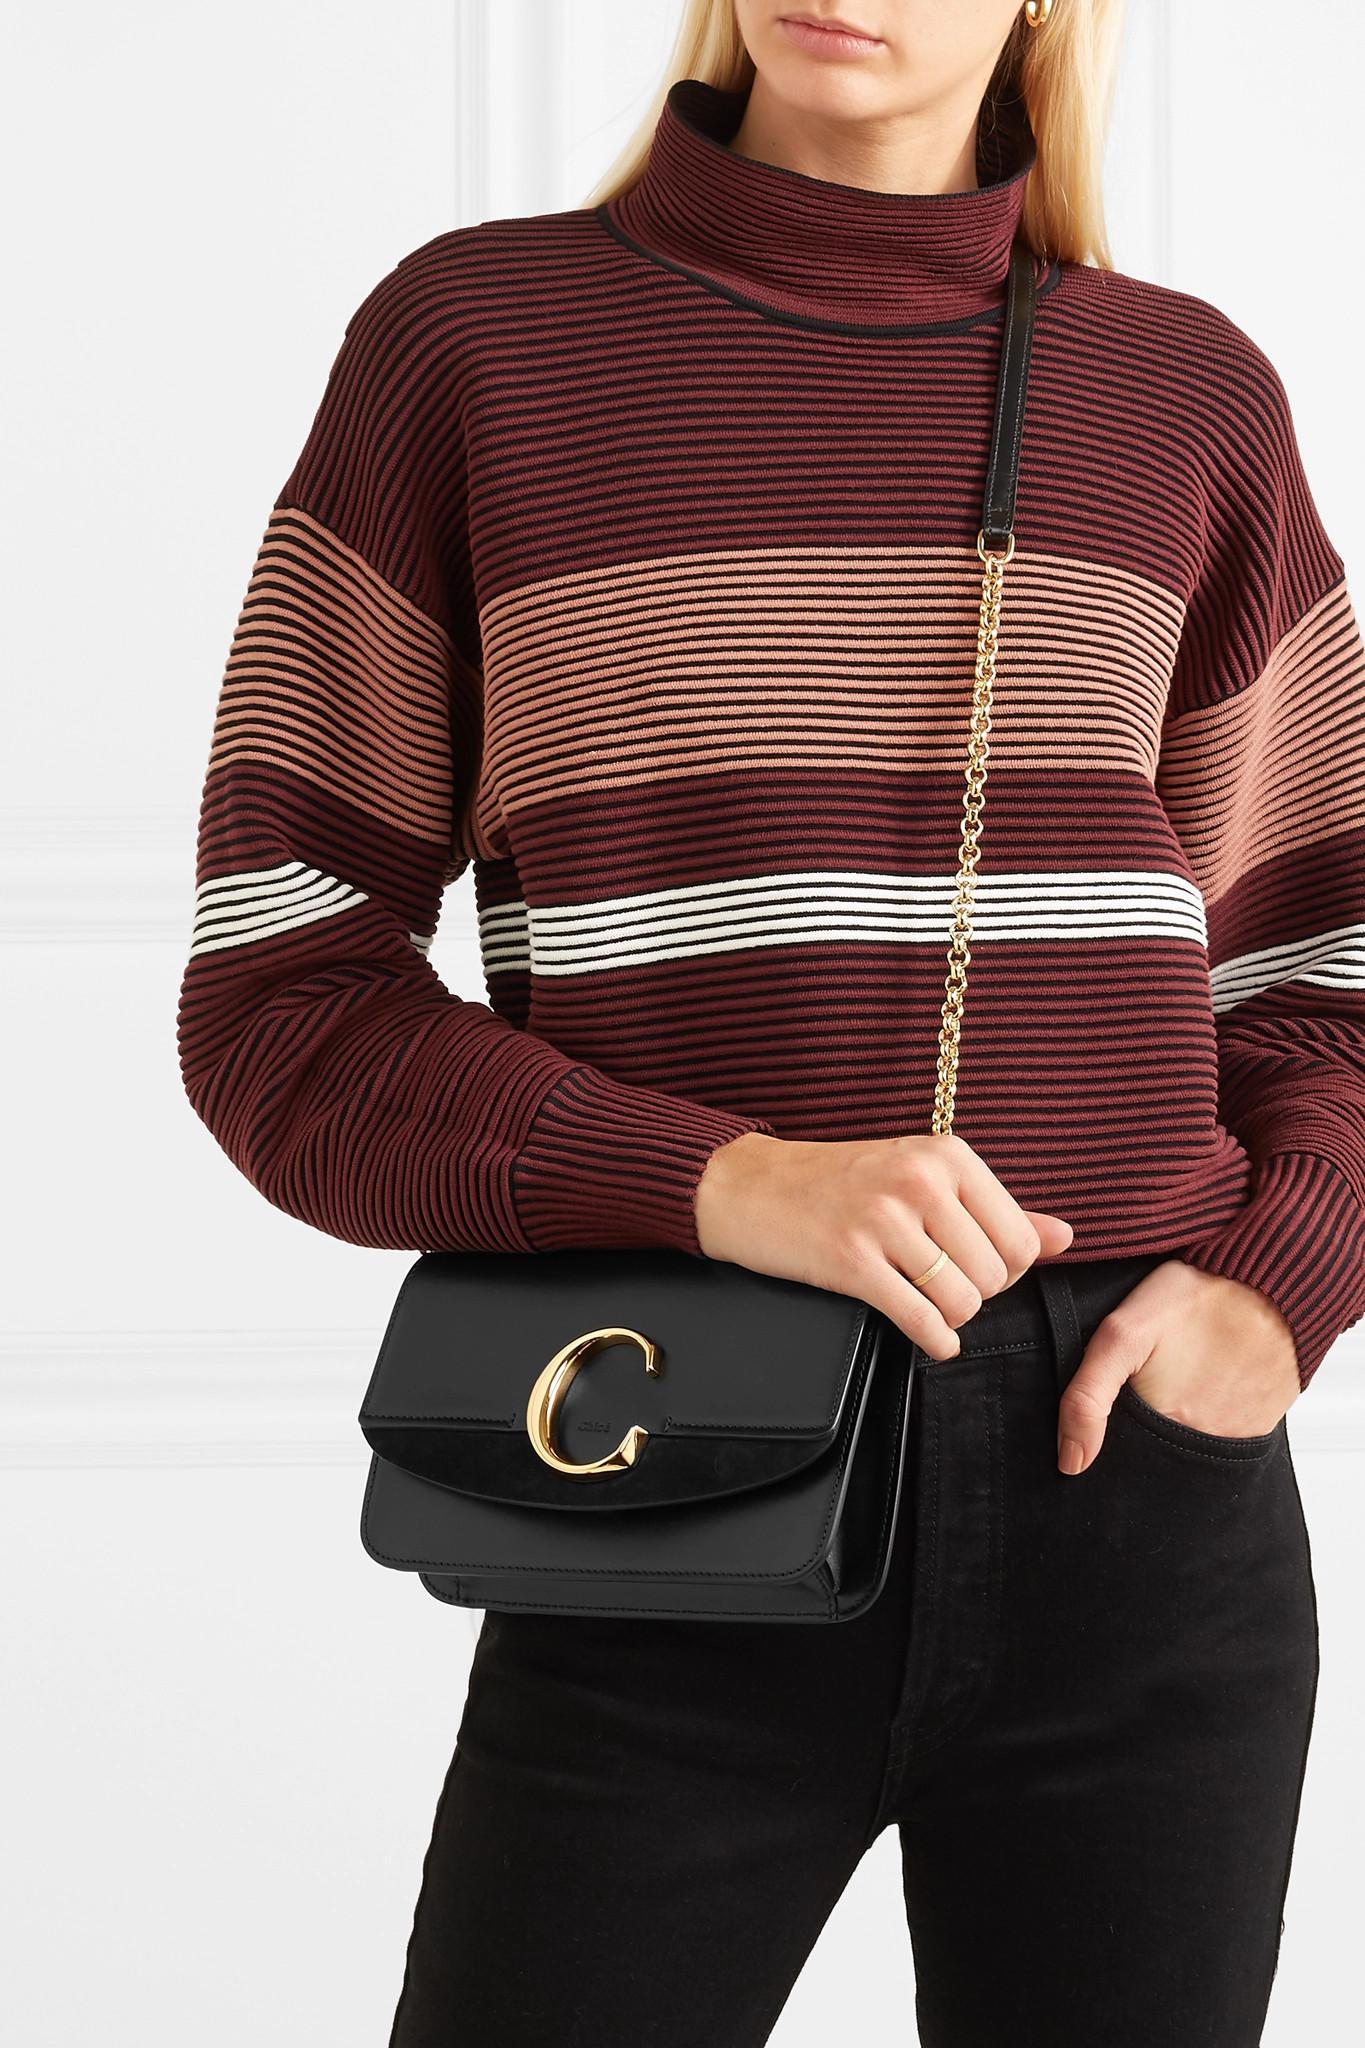 595ecef2167e2 Chloé - Black C Mini Suede-trimmed Leather Shoulder Bag - Lyst. View  fullscreen